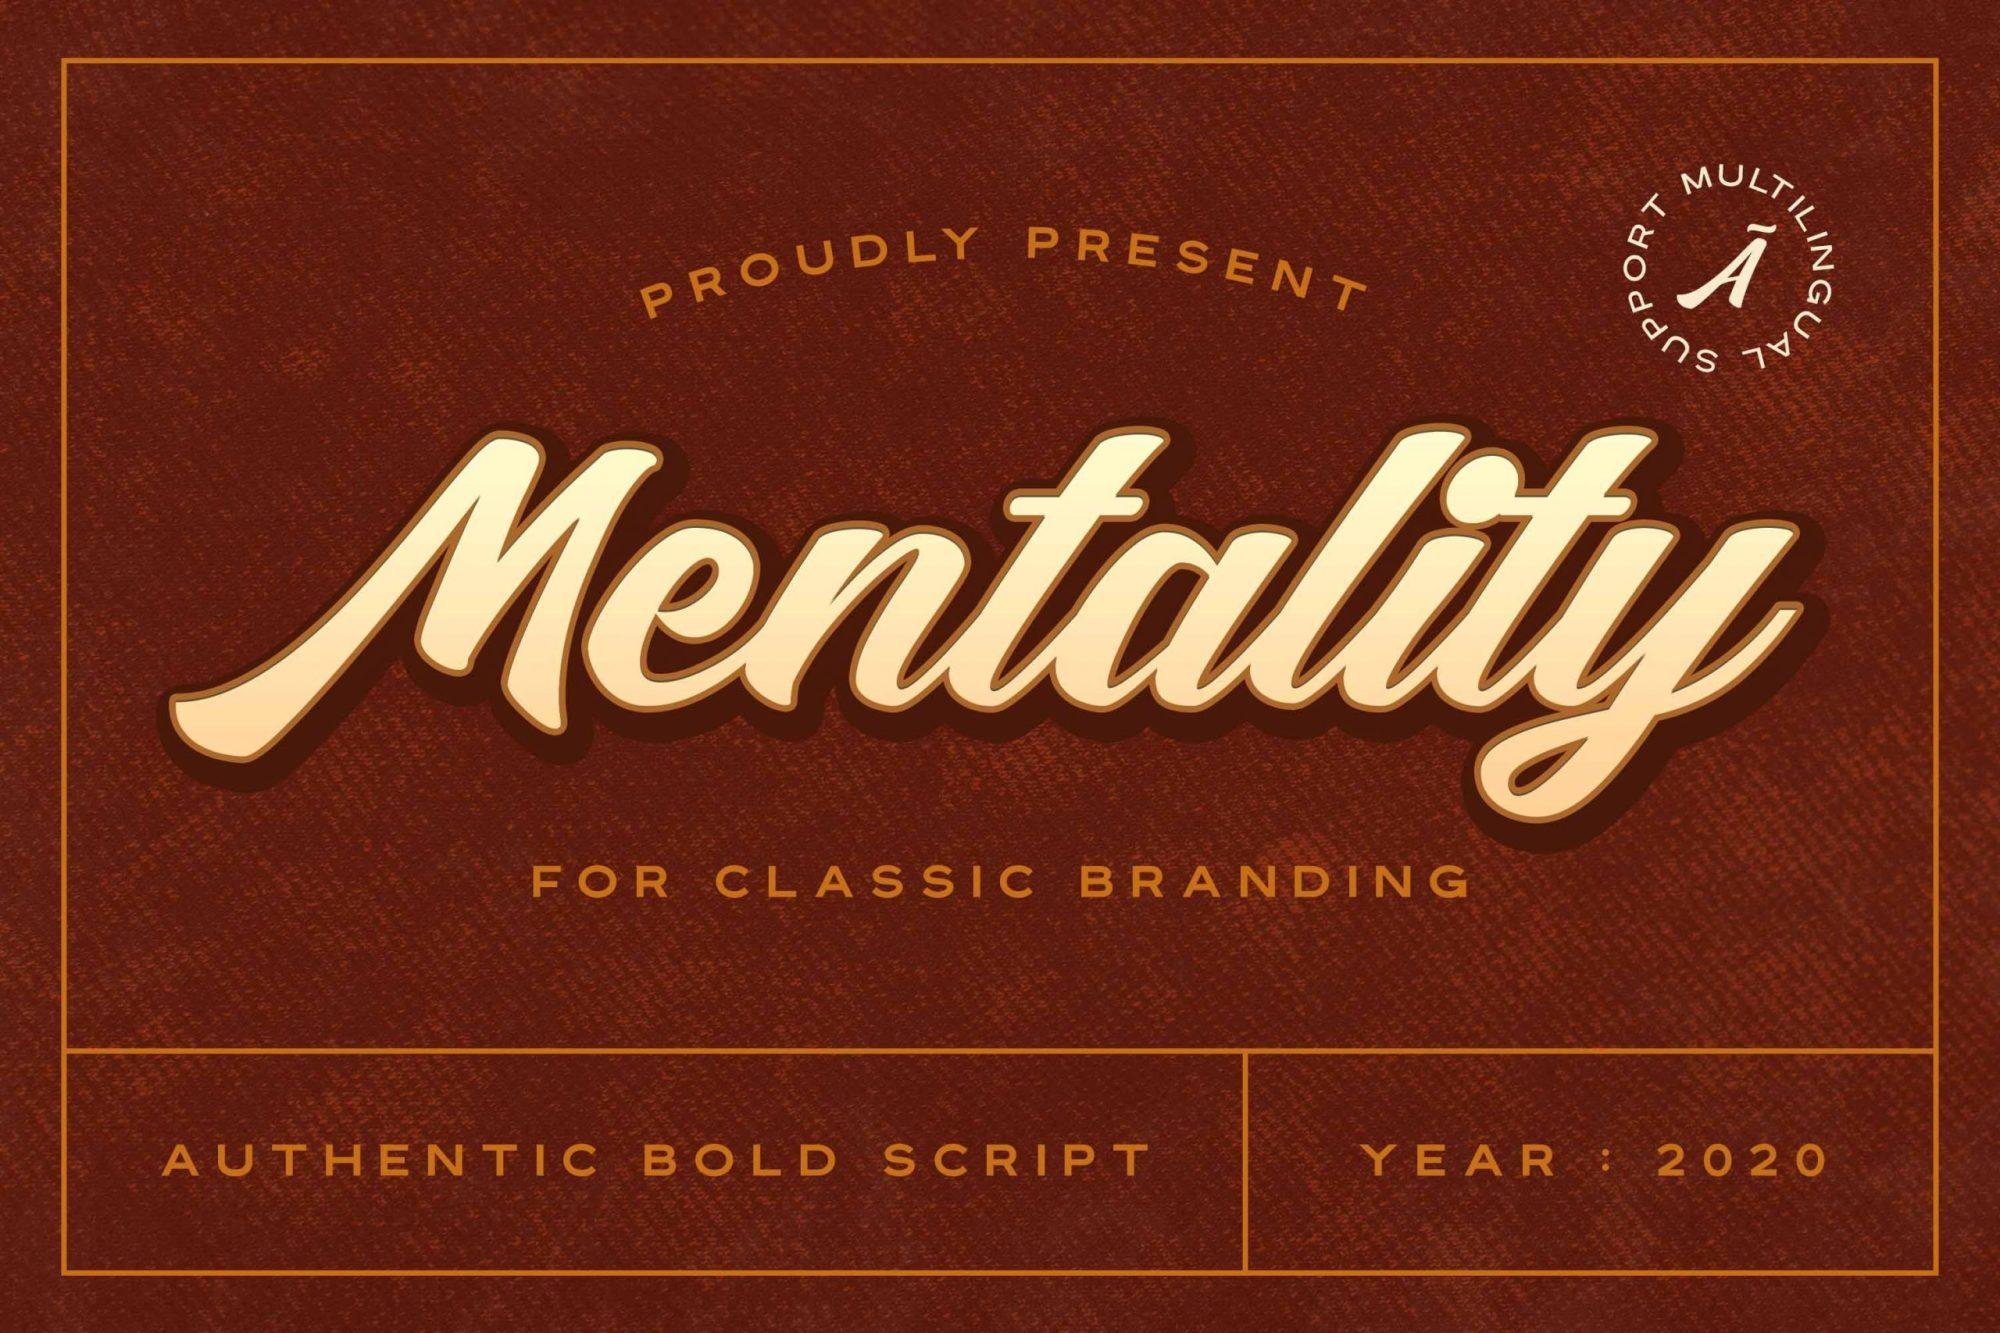 Mentality-Modern-Bold-Script-Font-1